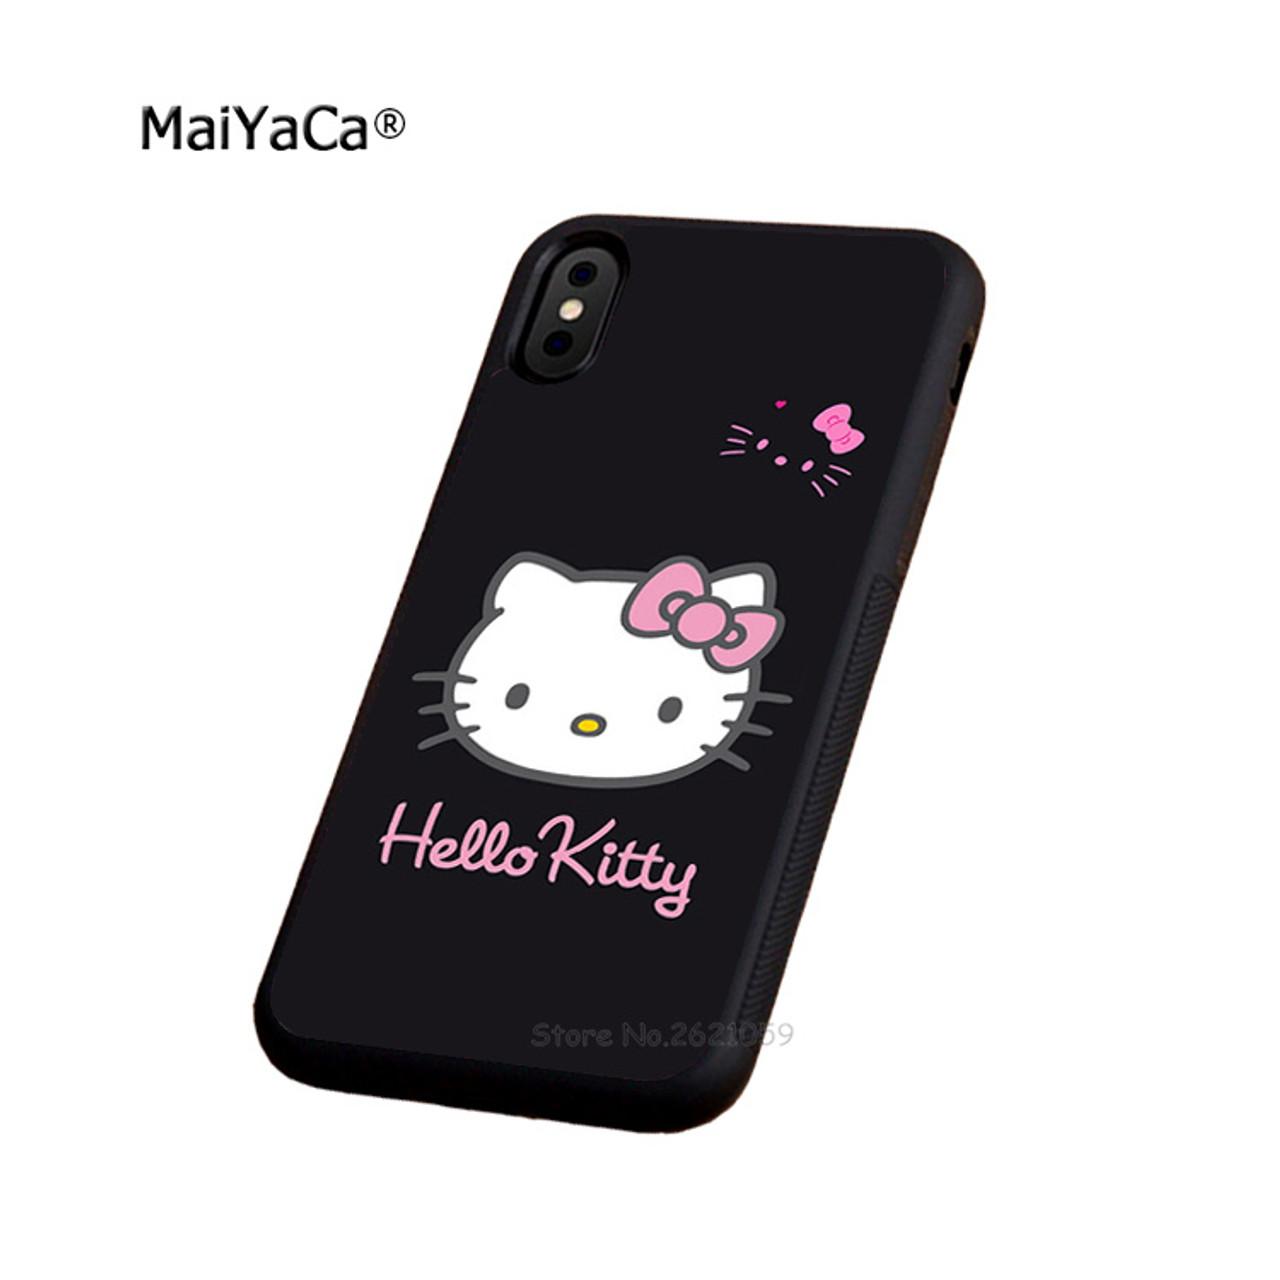 7d9d0a61c i love hello kitty soft edge phone case for iphone x 5c 5s se 6 6s 6plus  6splus 7 7plus 8 8plus black silicone cover case - OnshopDeals.Com